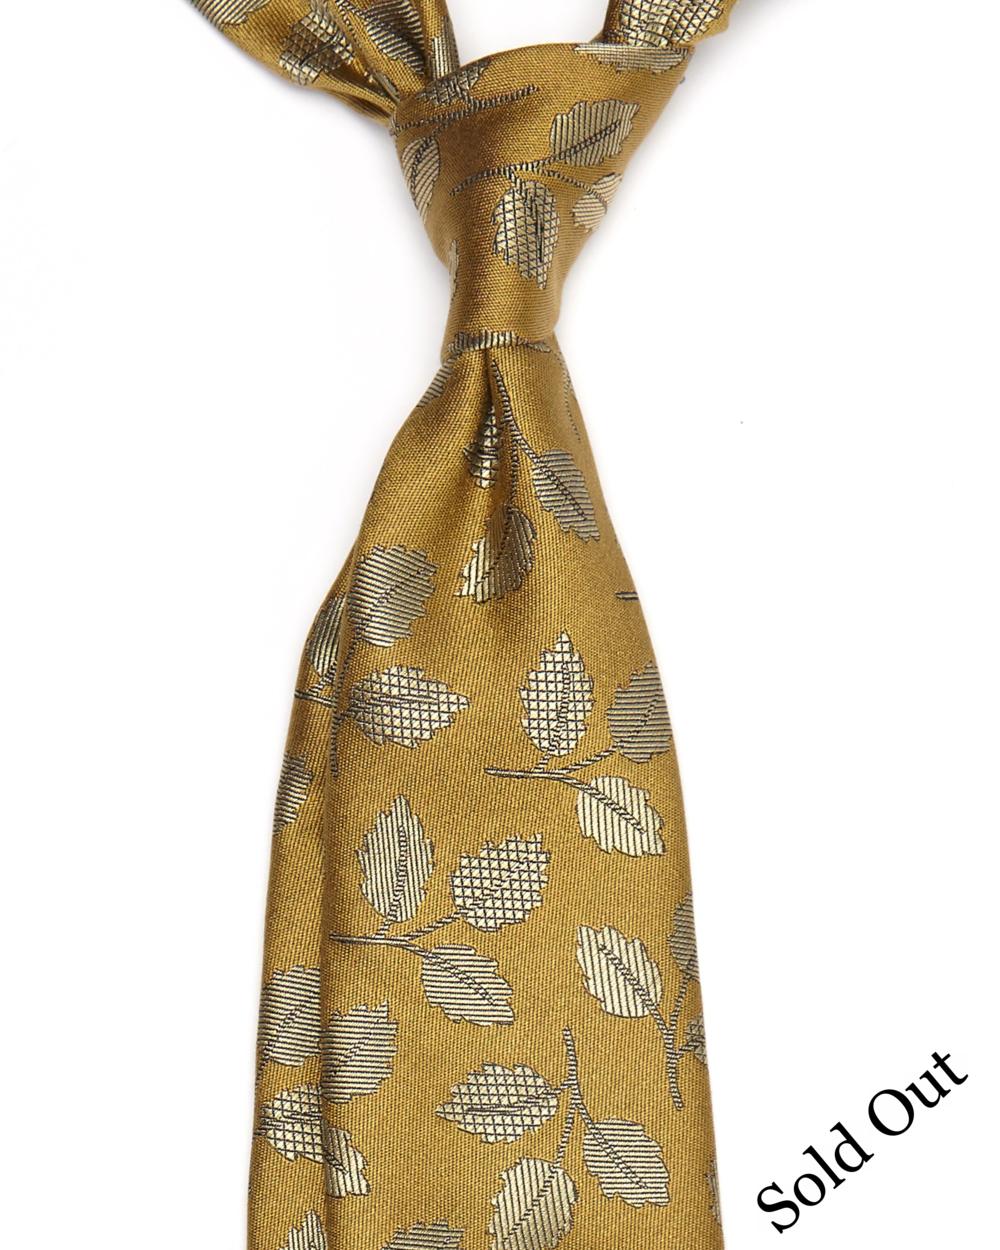 Hamilton Tie| Silk LeavesPattern | 6ExclusiveHandMade Ties Available- £98.00